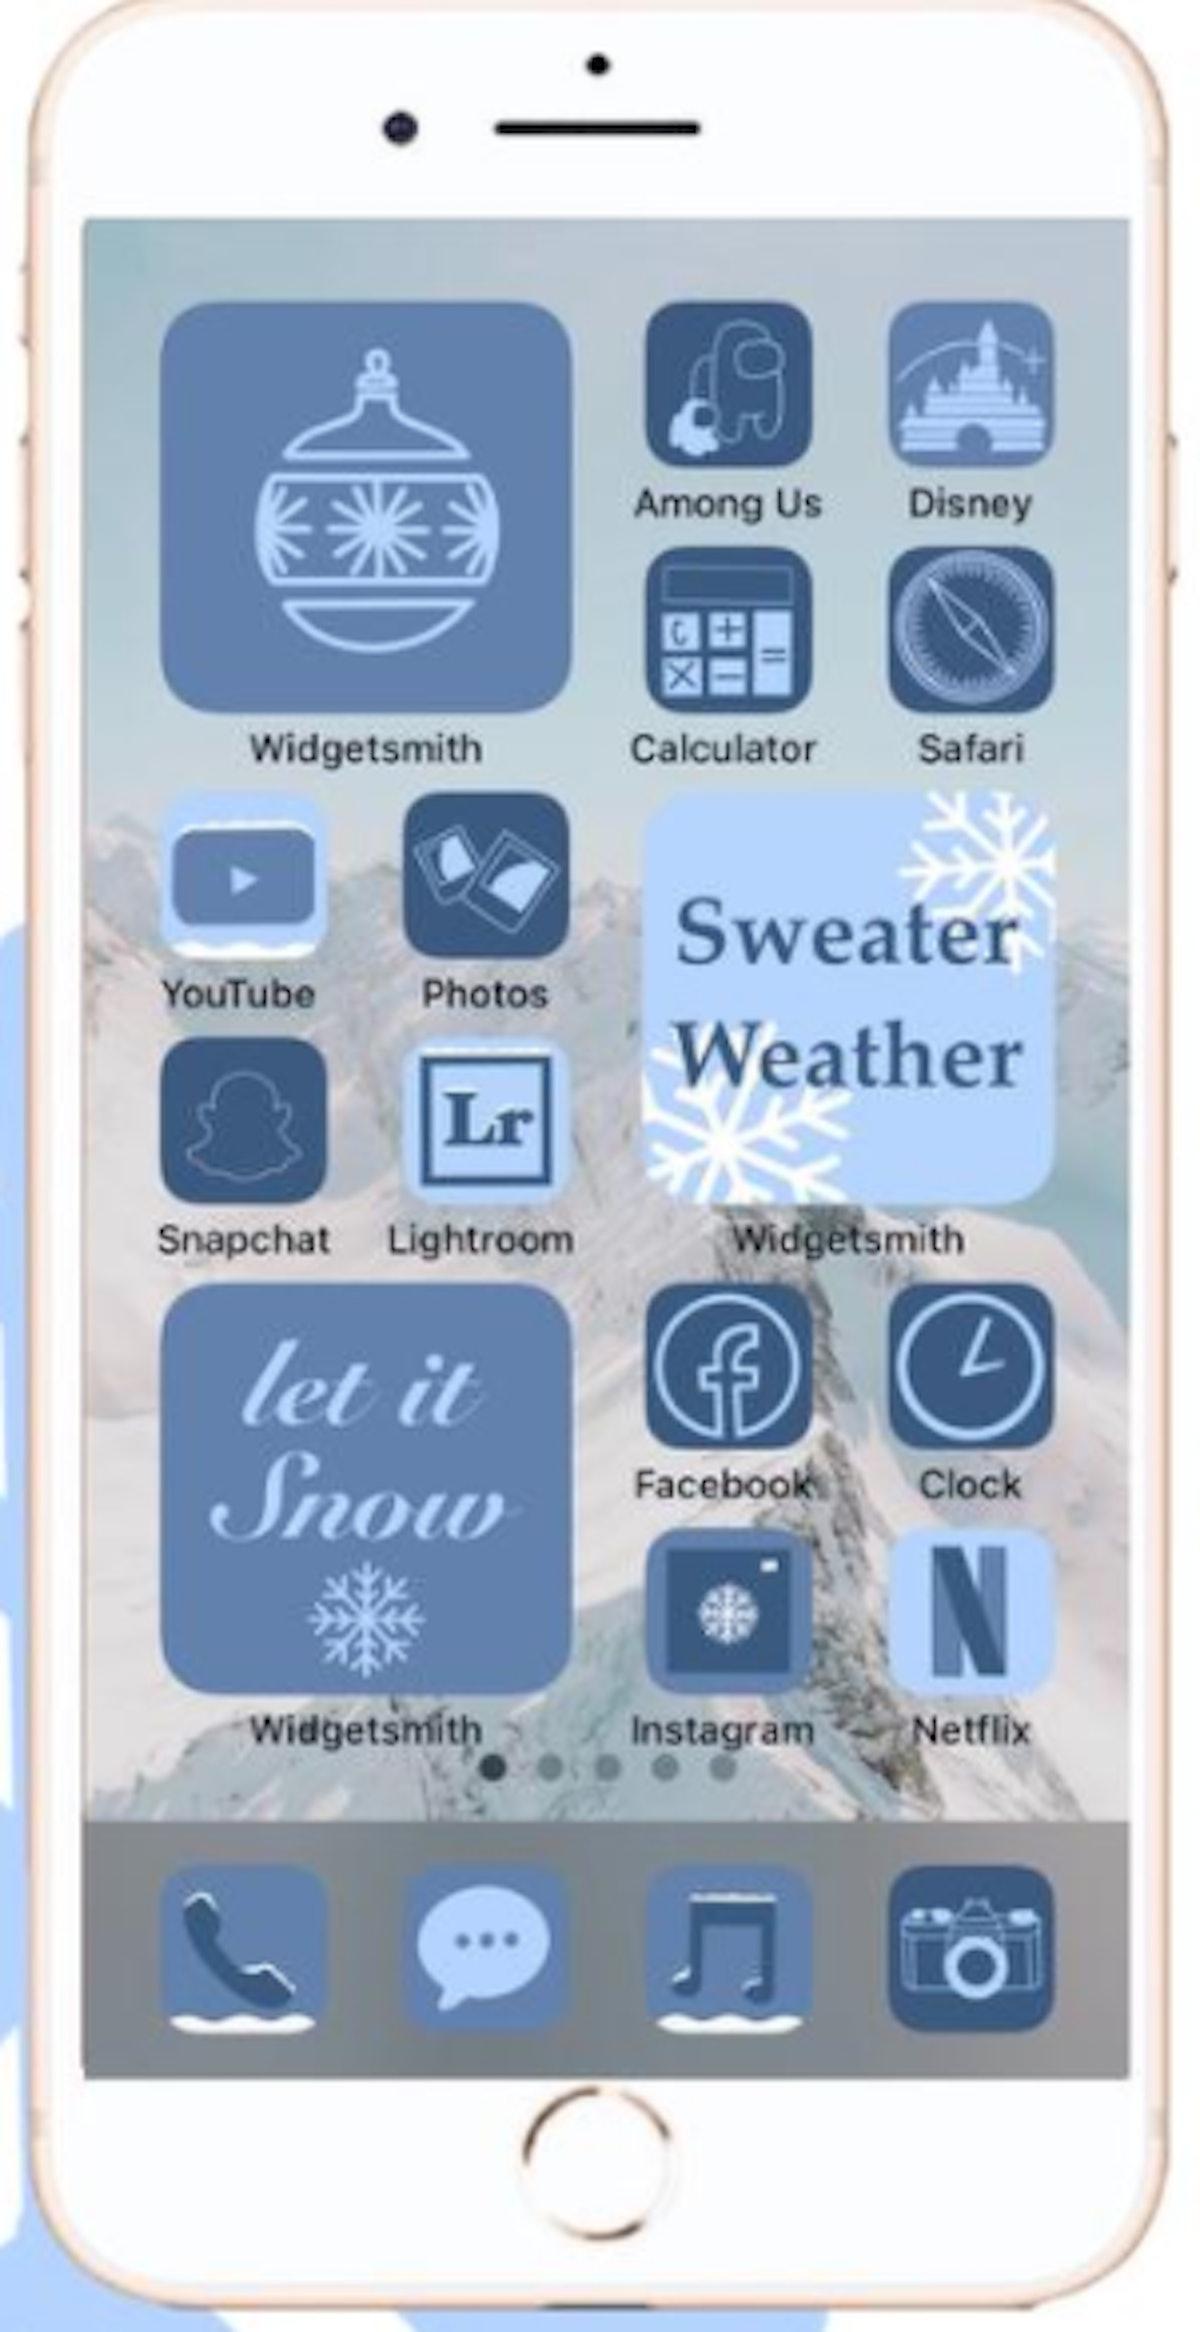 Icy Winter Wonderland iOS 14 Home Screen Theme